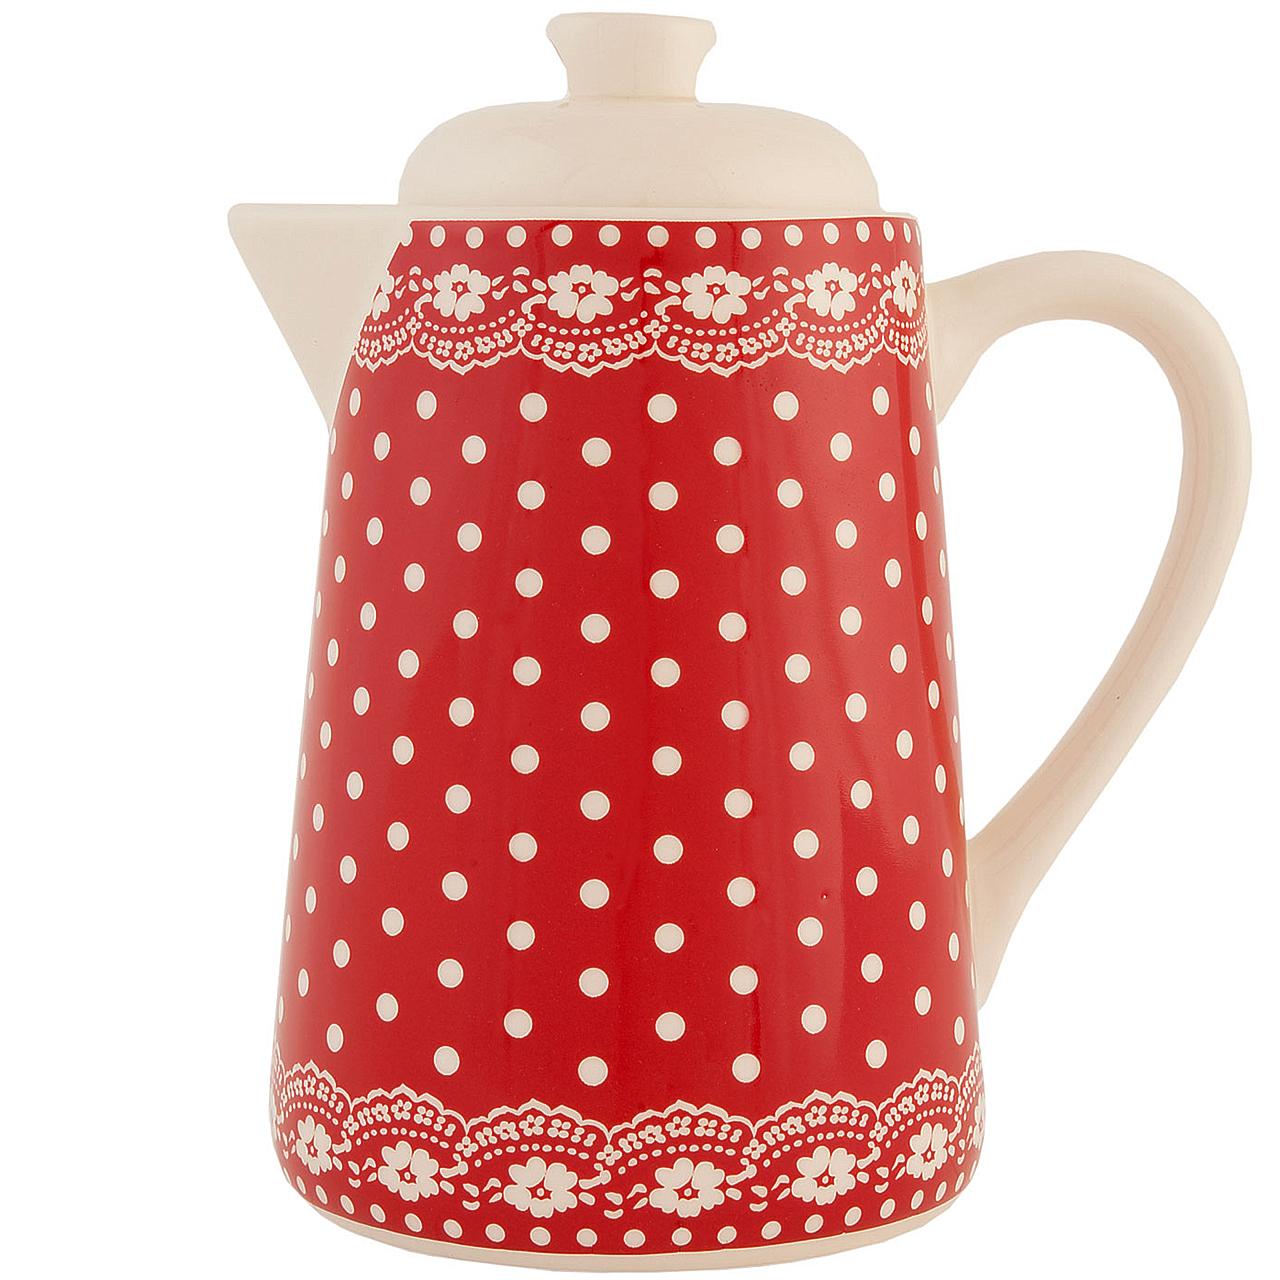 Ceainic Din Ceramica Rosie Cu Buline